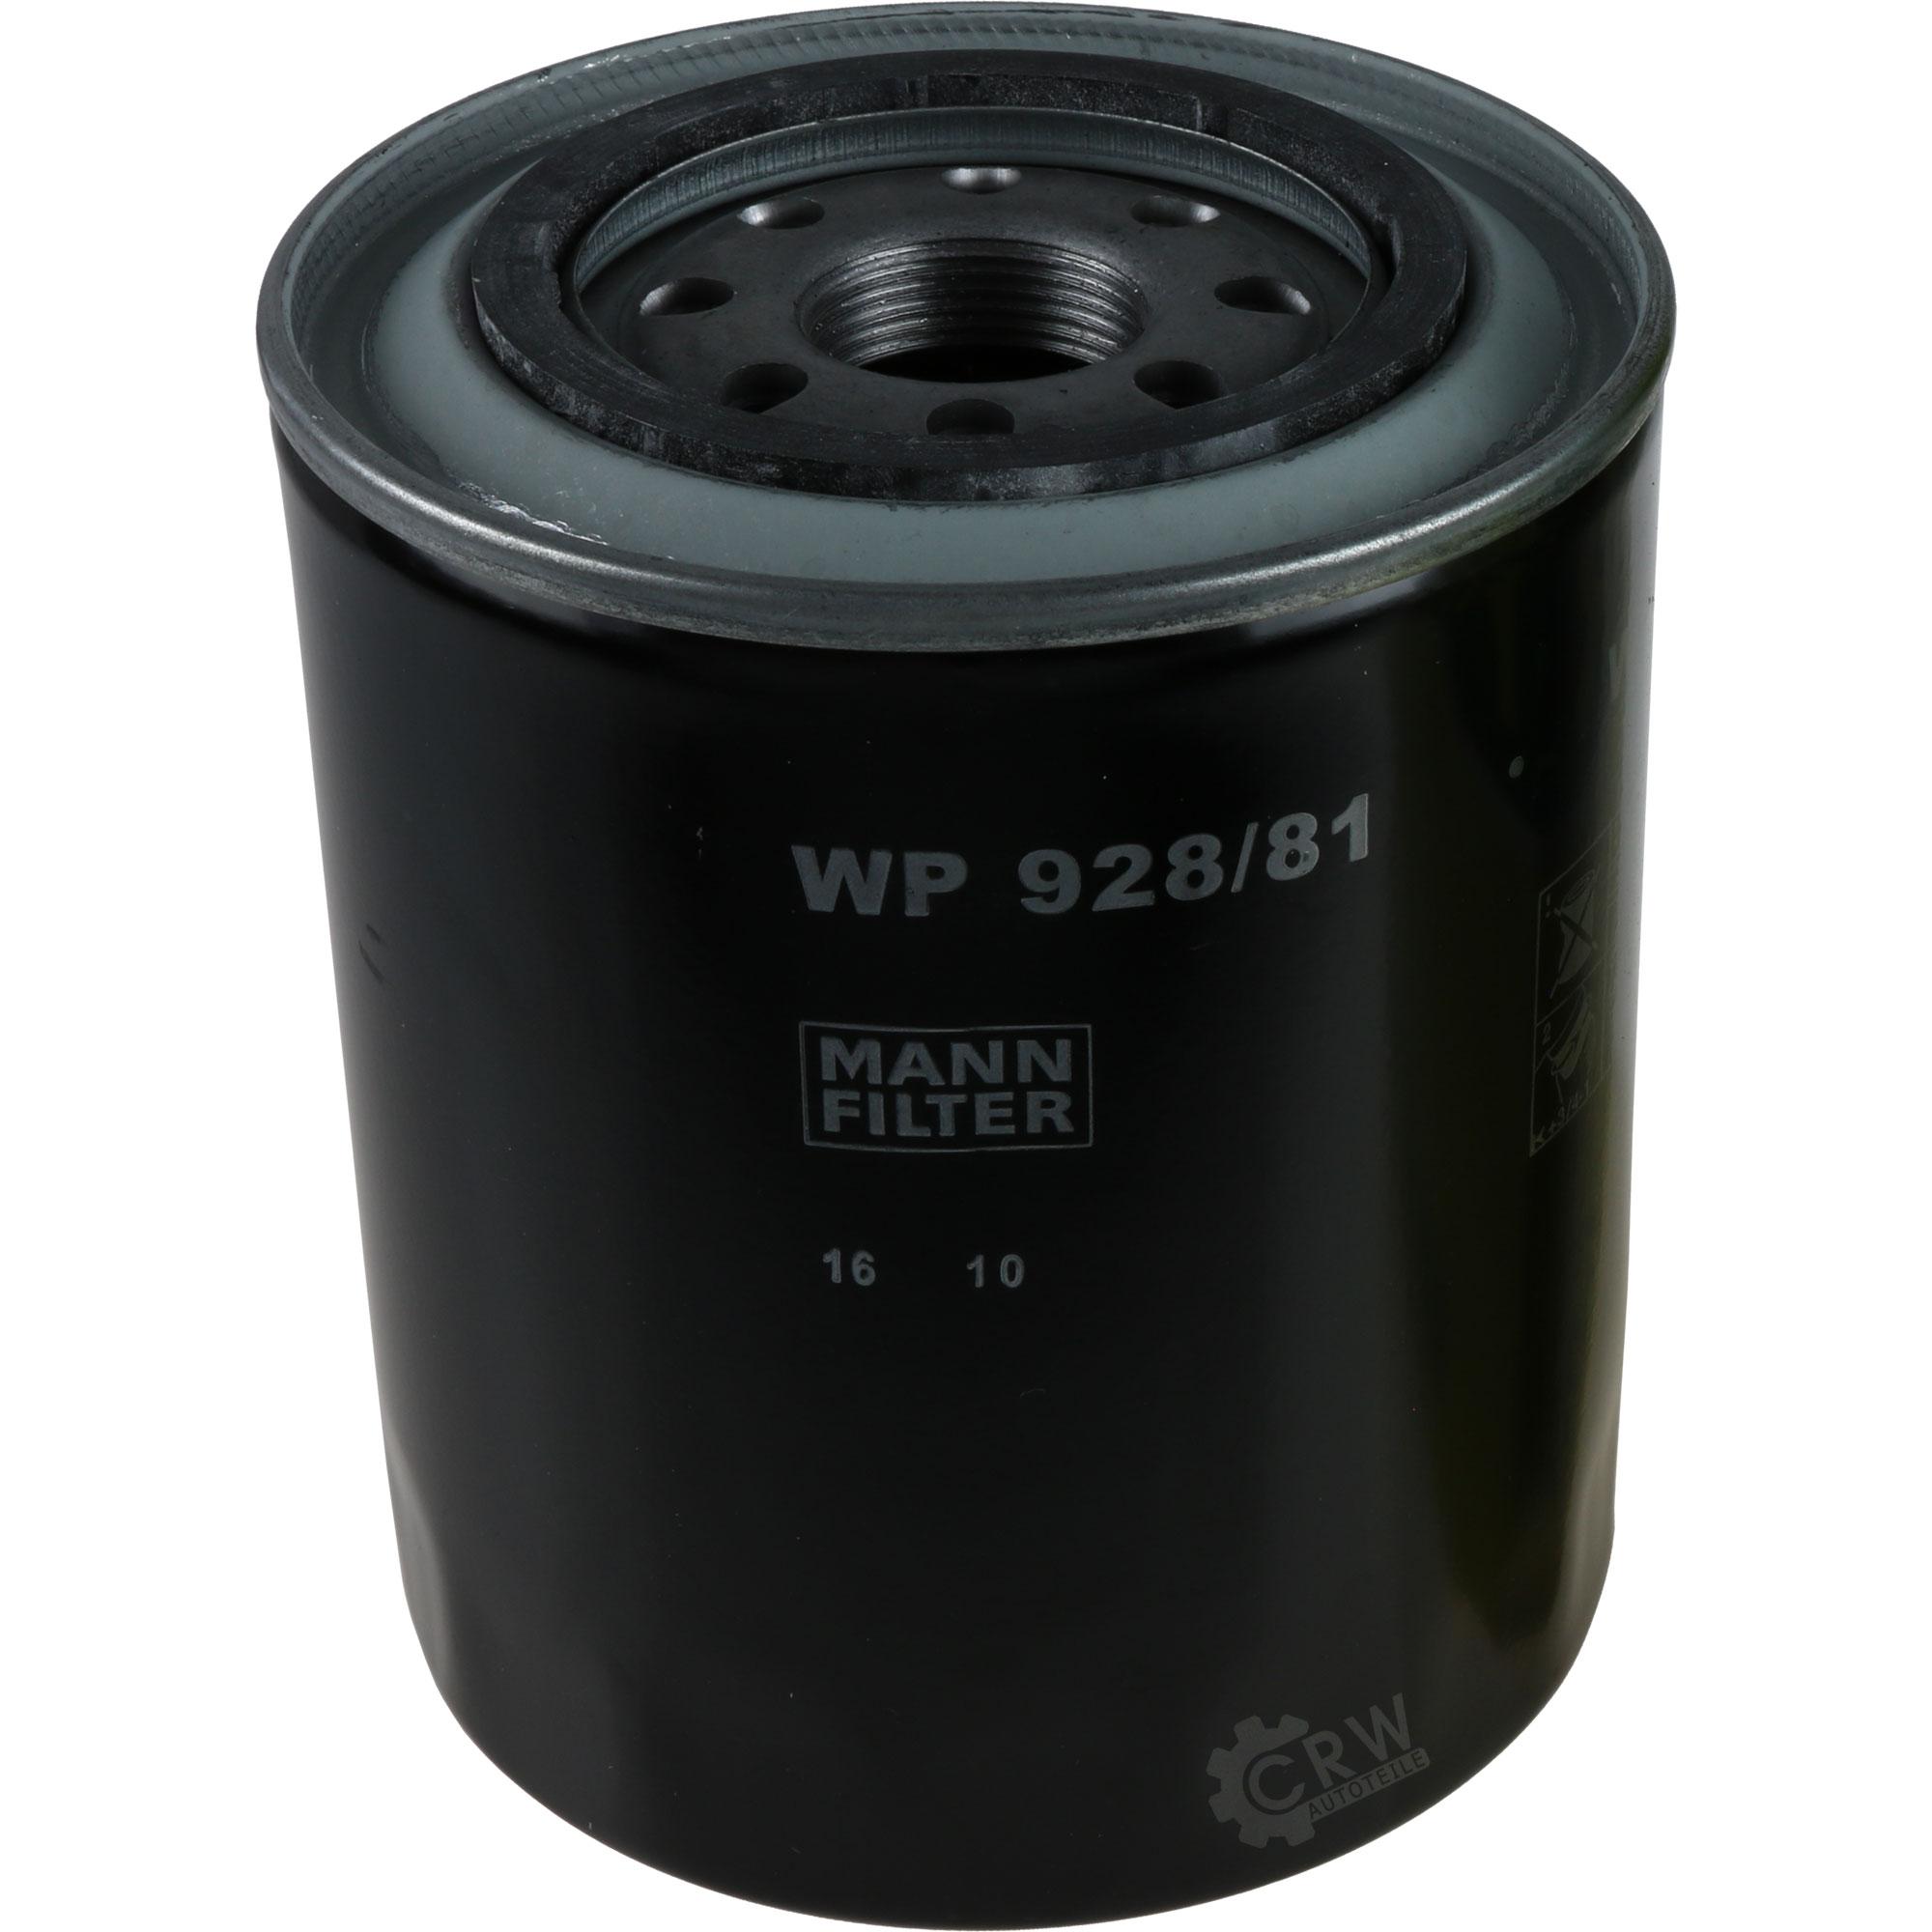 Original-MANN-Filter-Inspektionspaket-Set-SCT-Motor-Flush-Motorspuelung-11574489 Indexbild 12